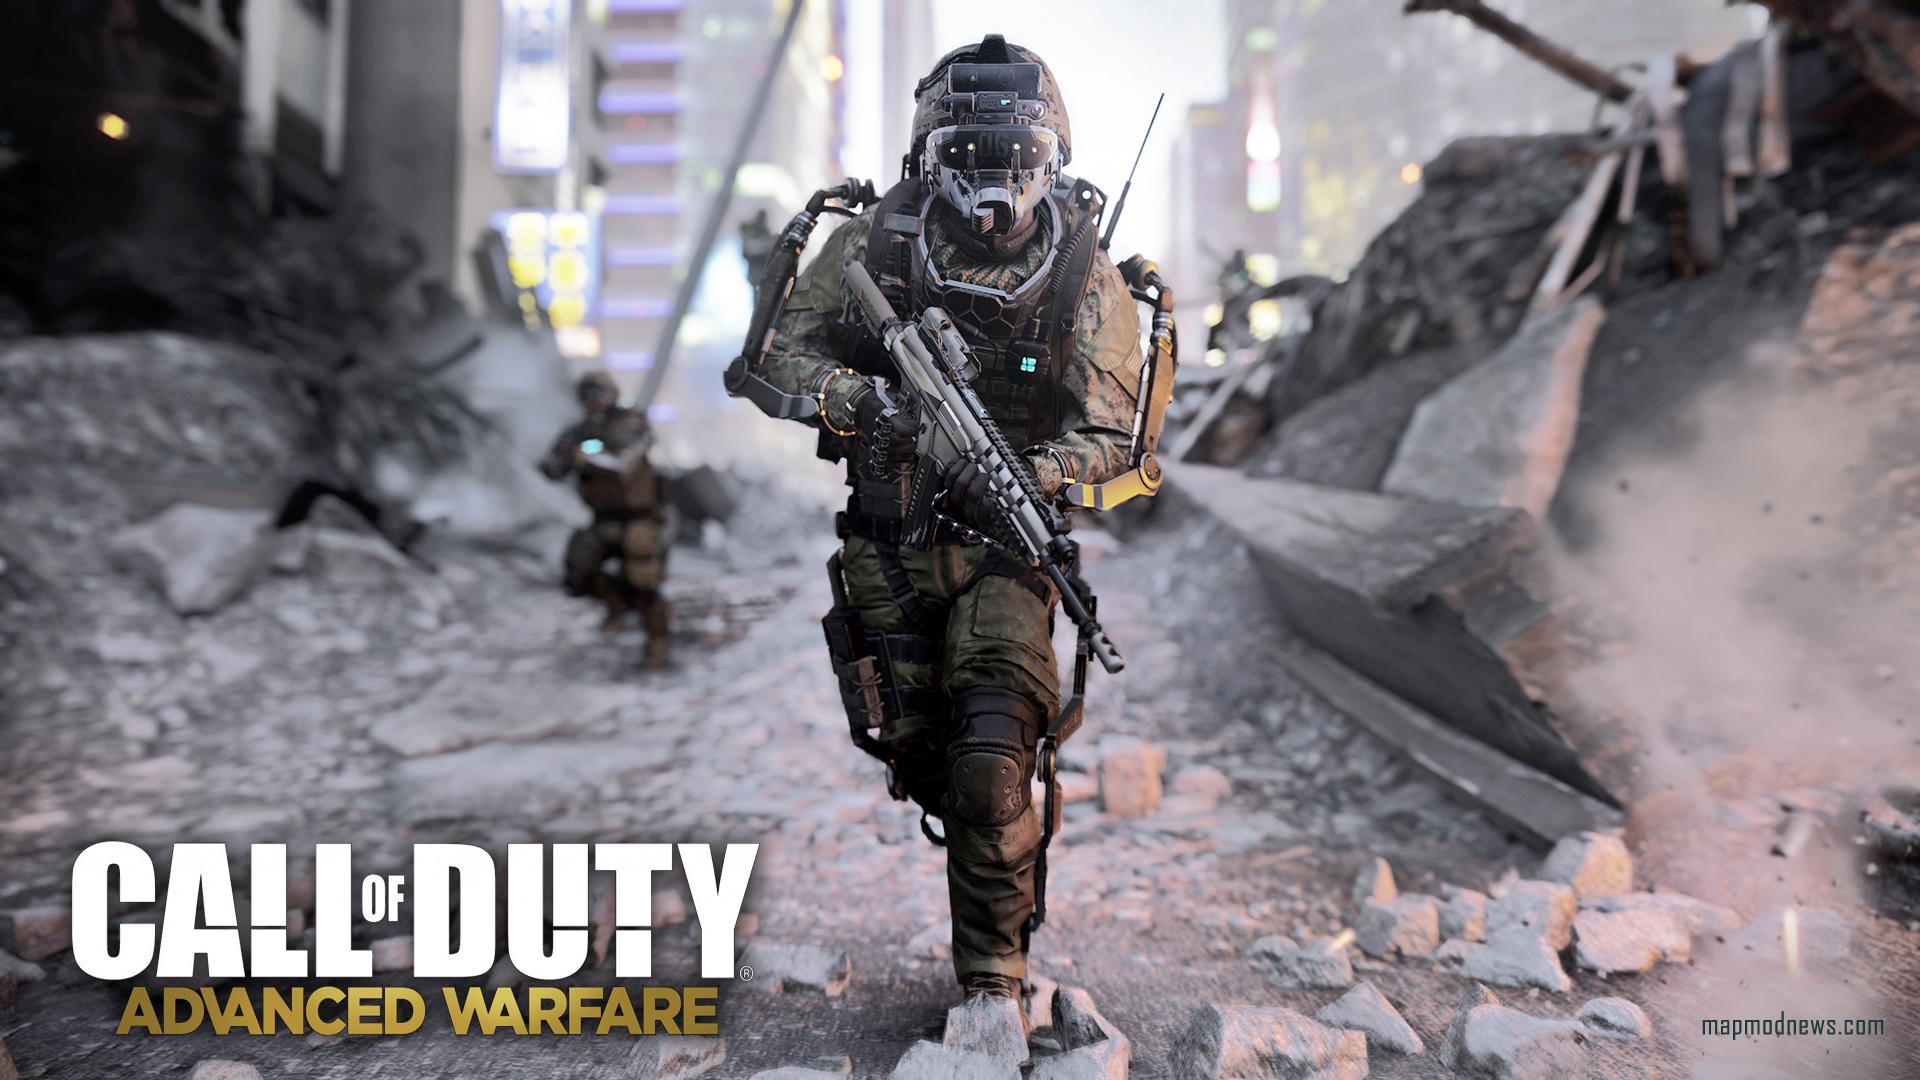 Call-of-Duty-Advanced-Warfare-wallpaper